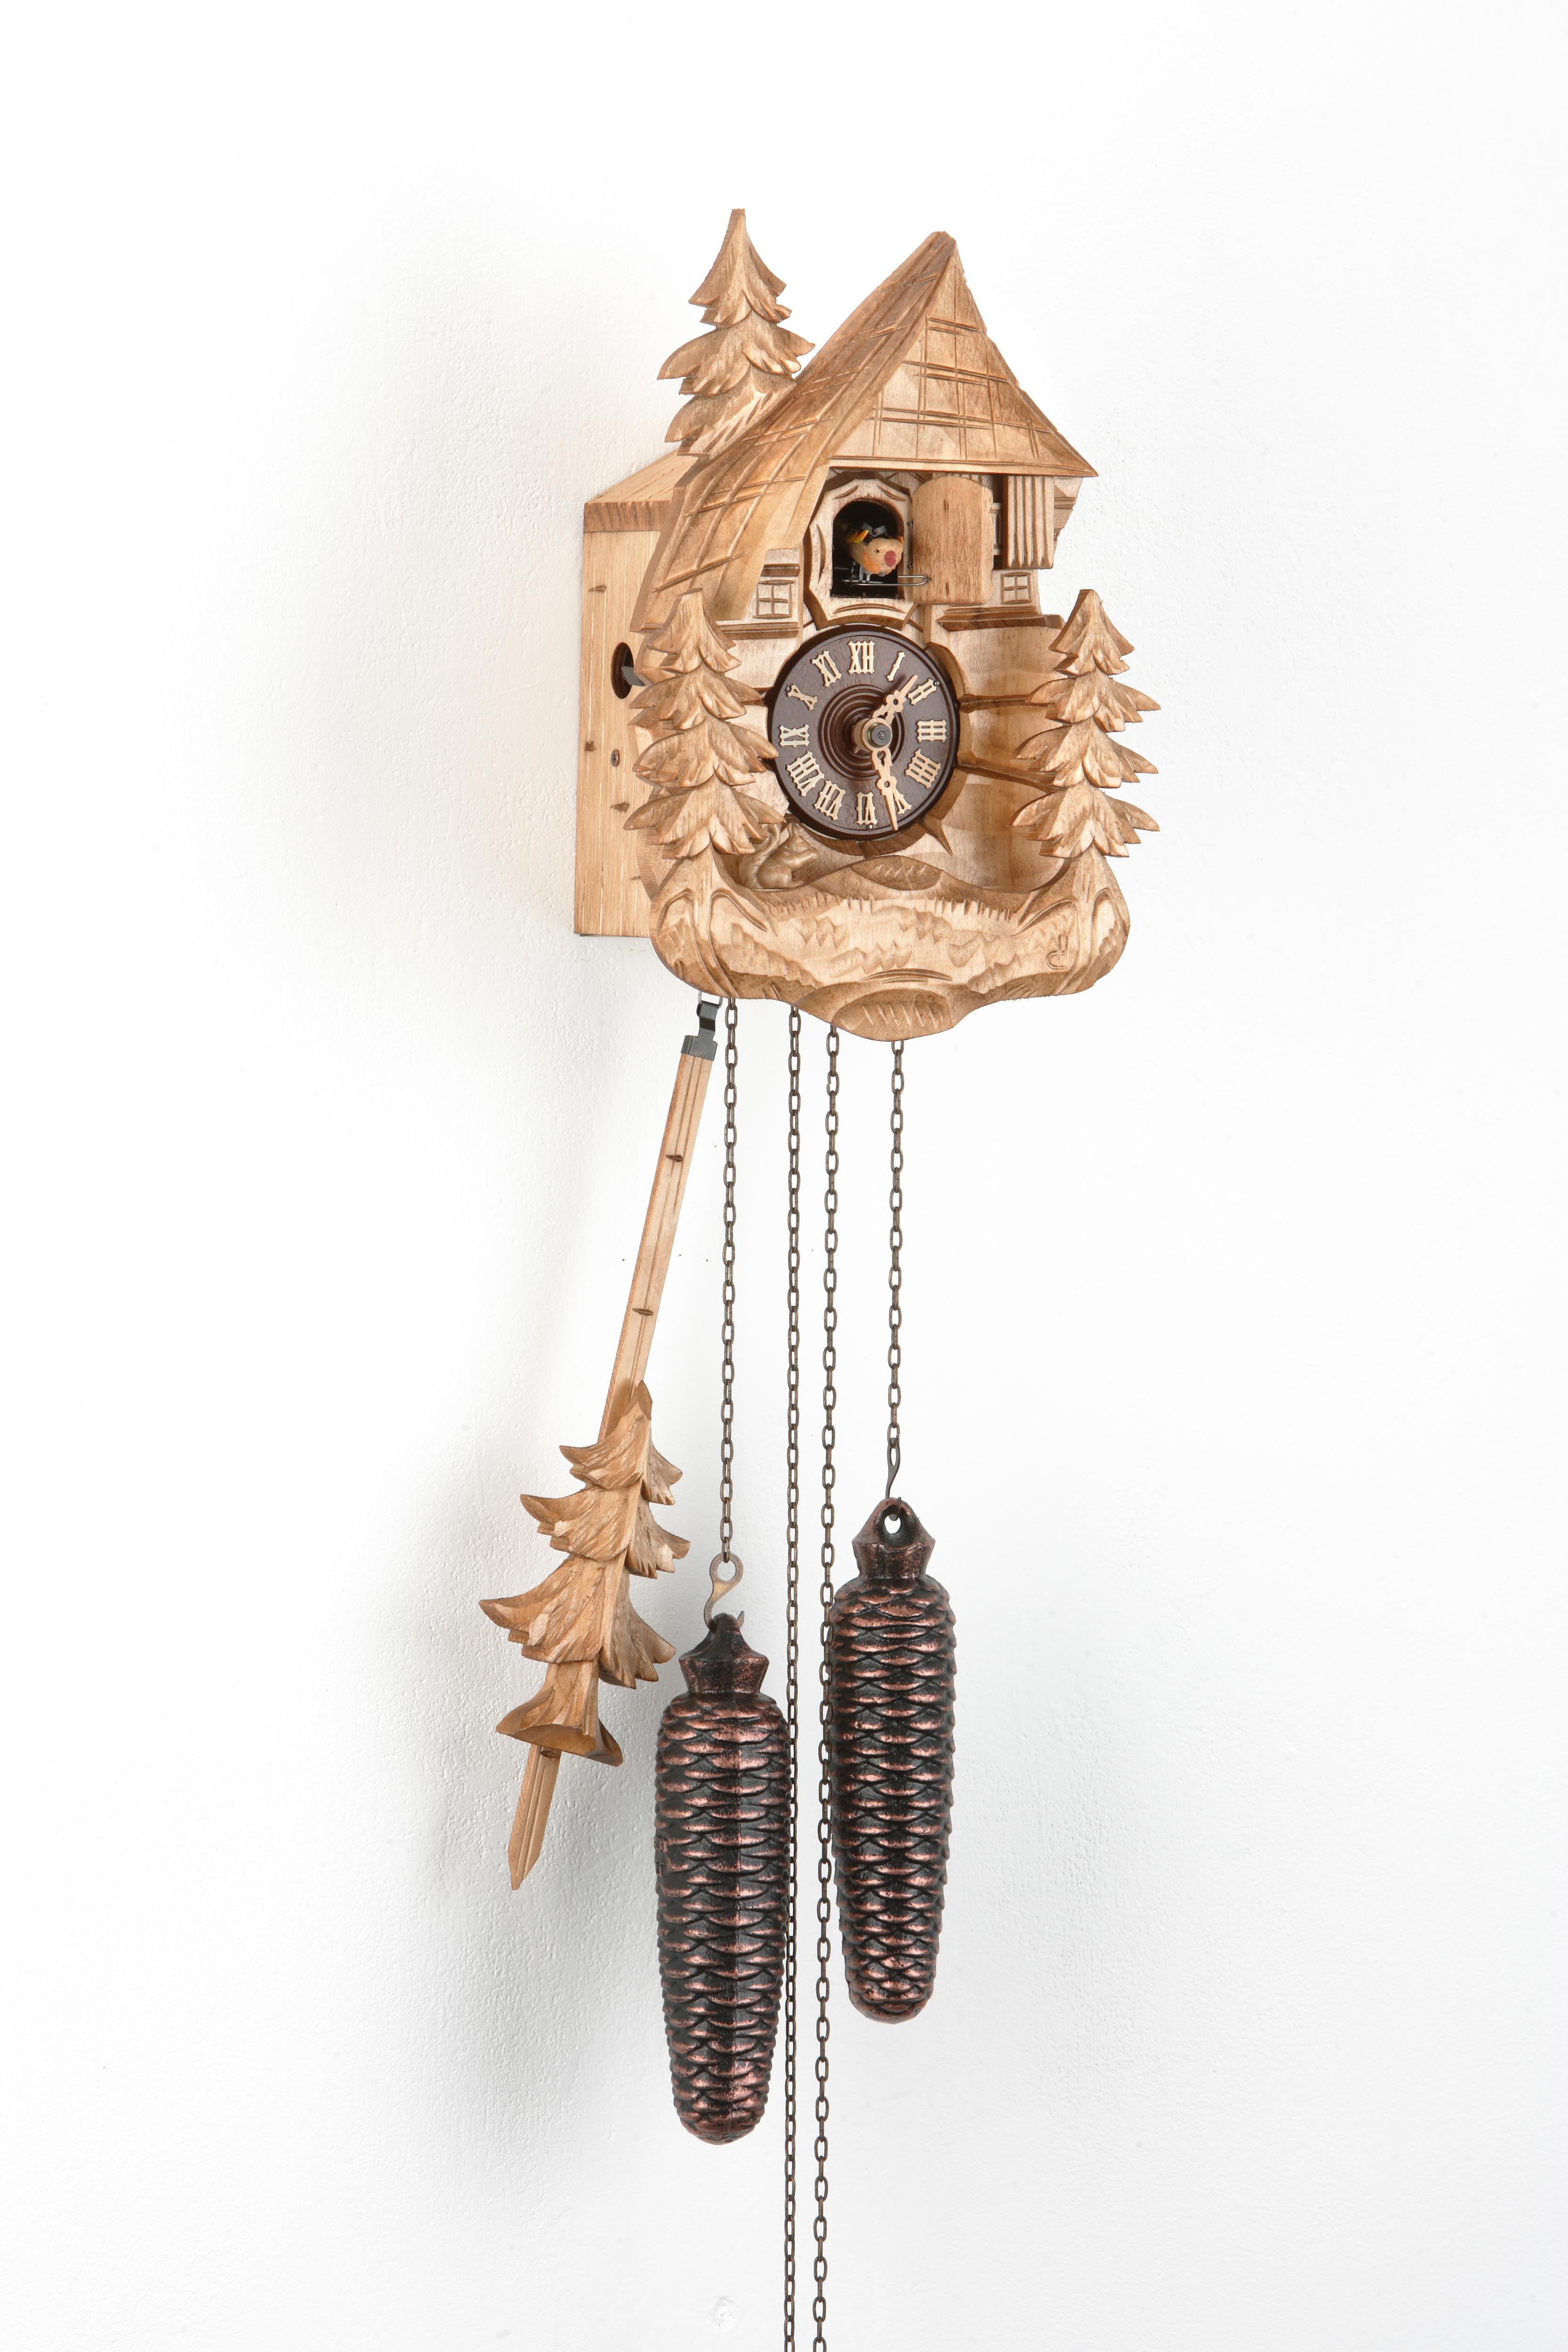 8 Days Cuckoo Clock Black Forest Farmhouse with squirrel